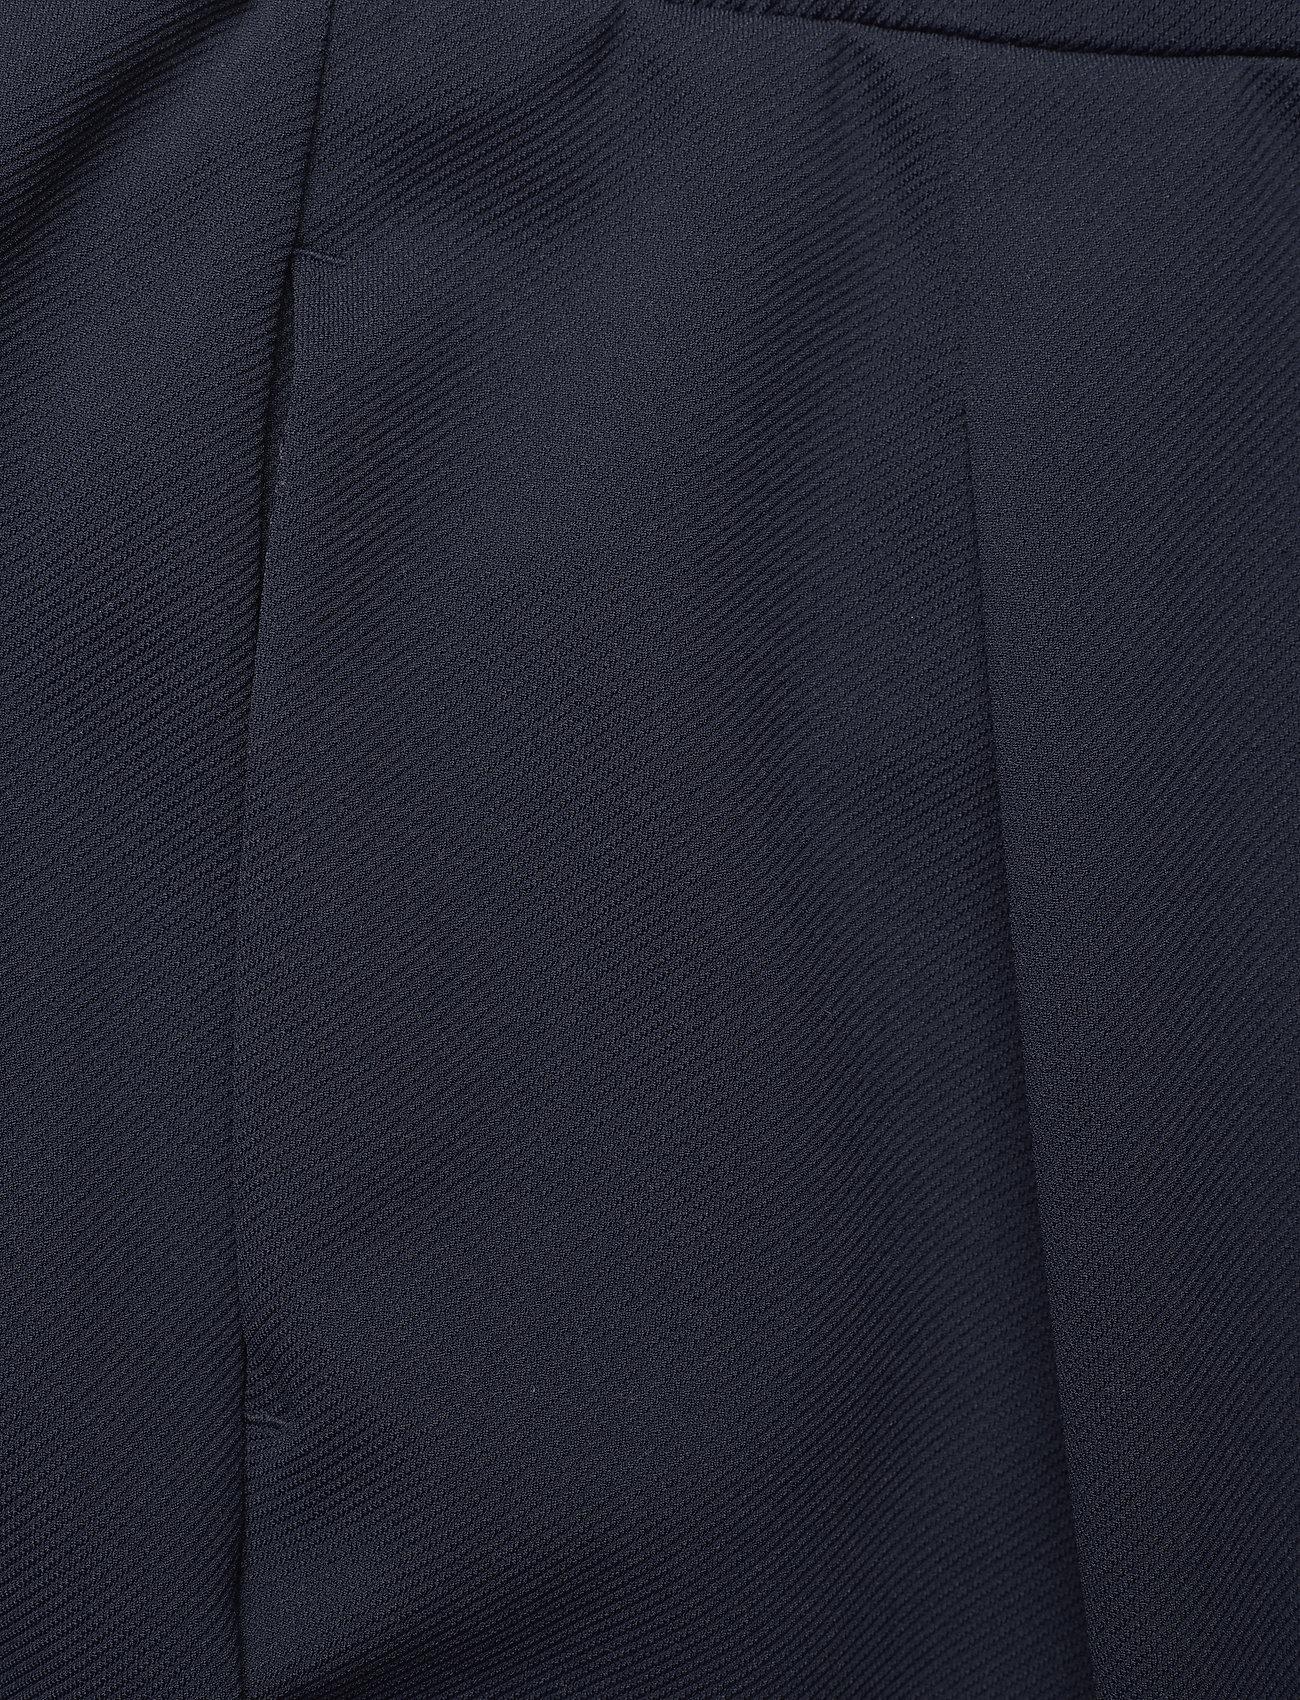 Max Mara Leisure - MILENA - wide leg trousers - navy - 2